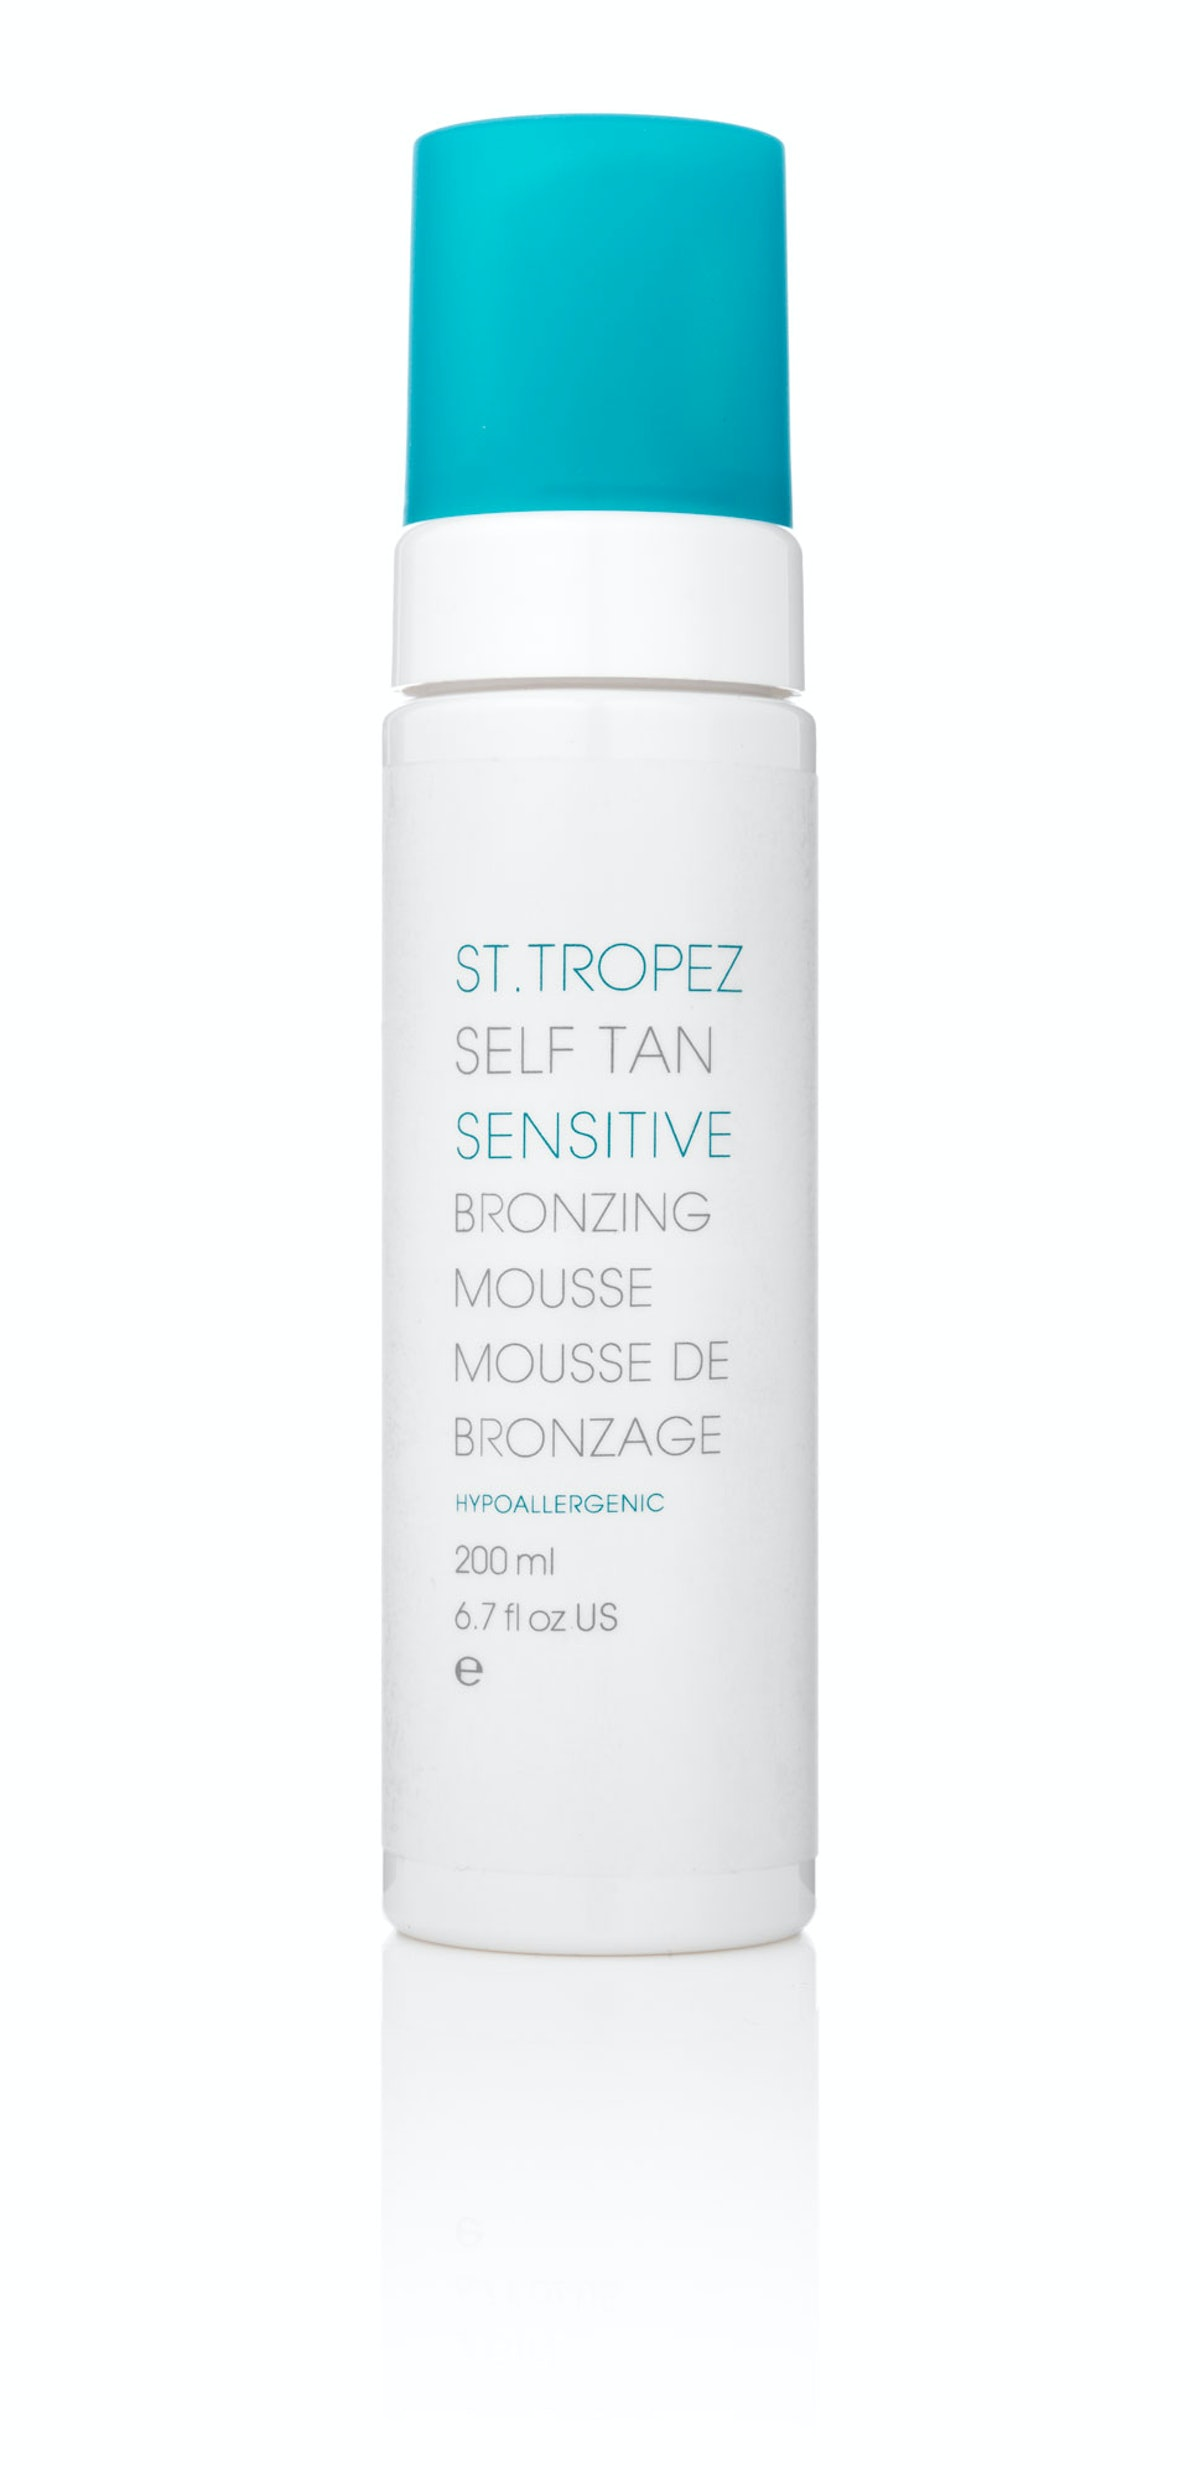 St. Tropez Self Tan Sensitive Bronzing Mousse